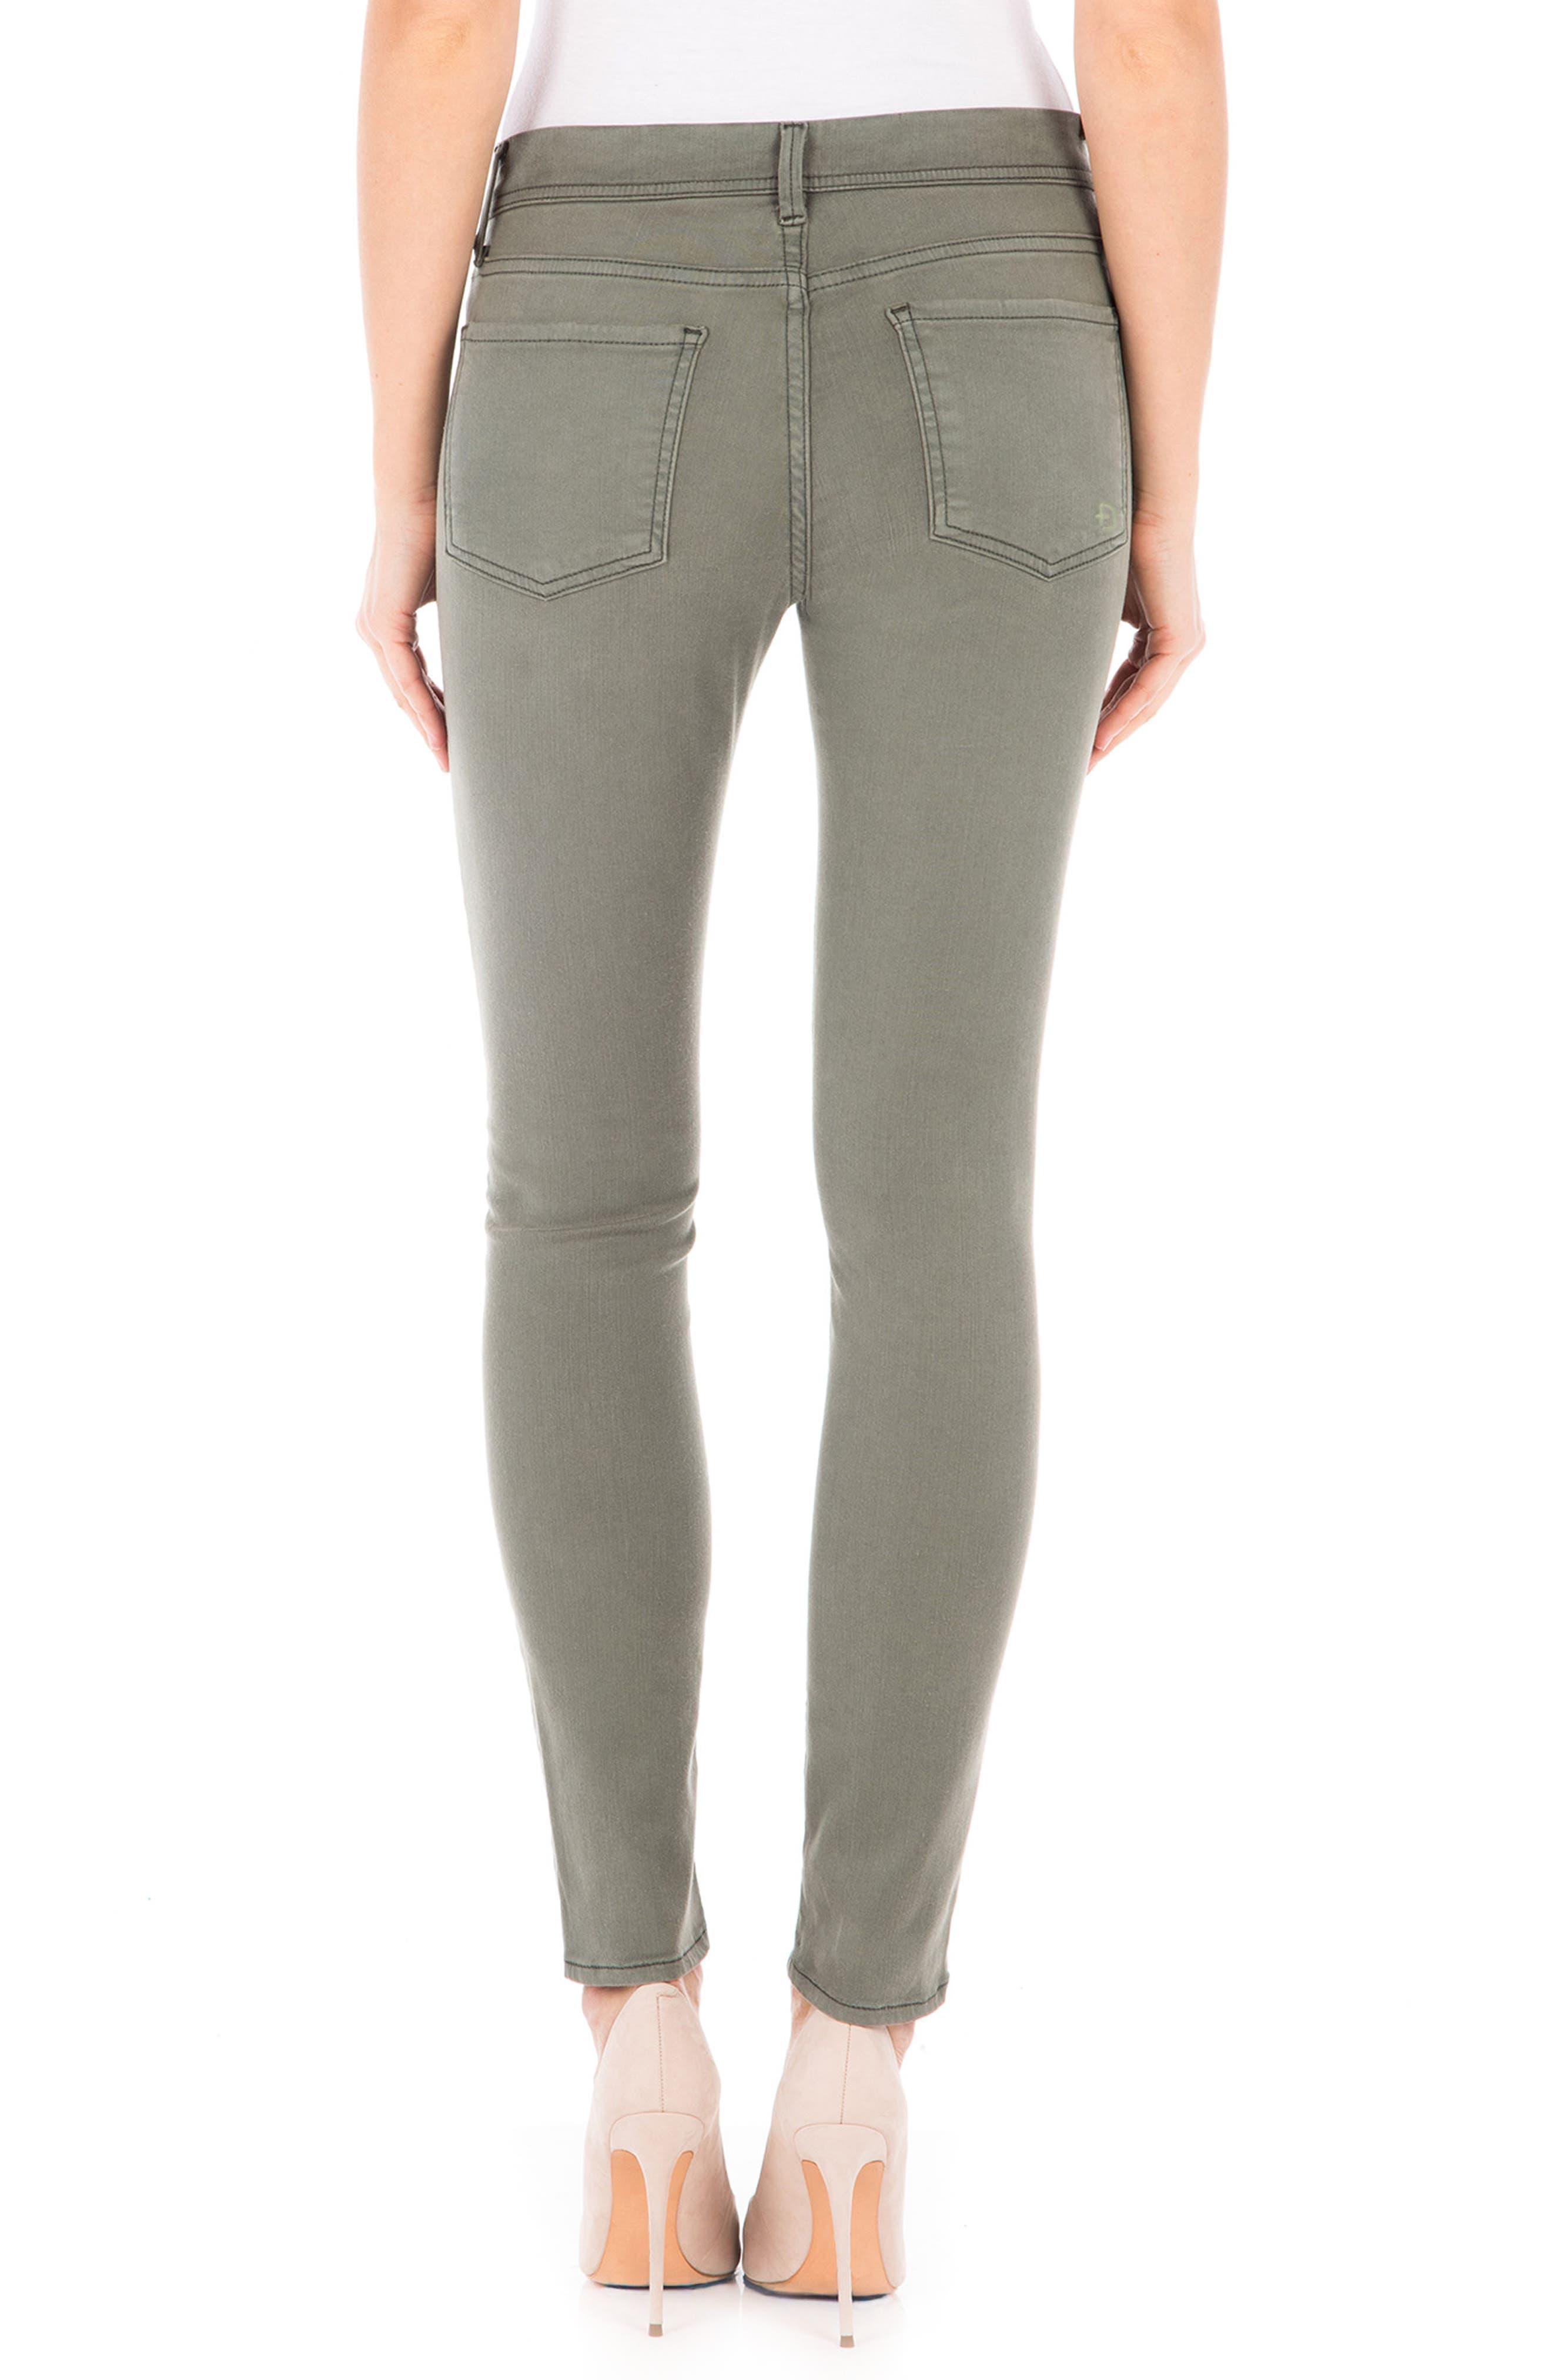 Sola Skinny Jeans,                             Alternate thumbnail 2, color,                             300